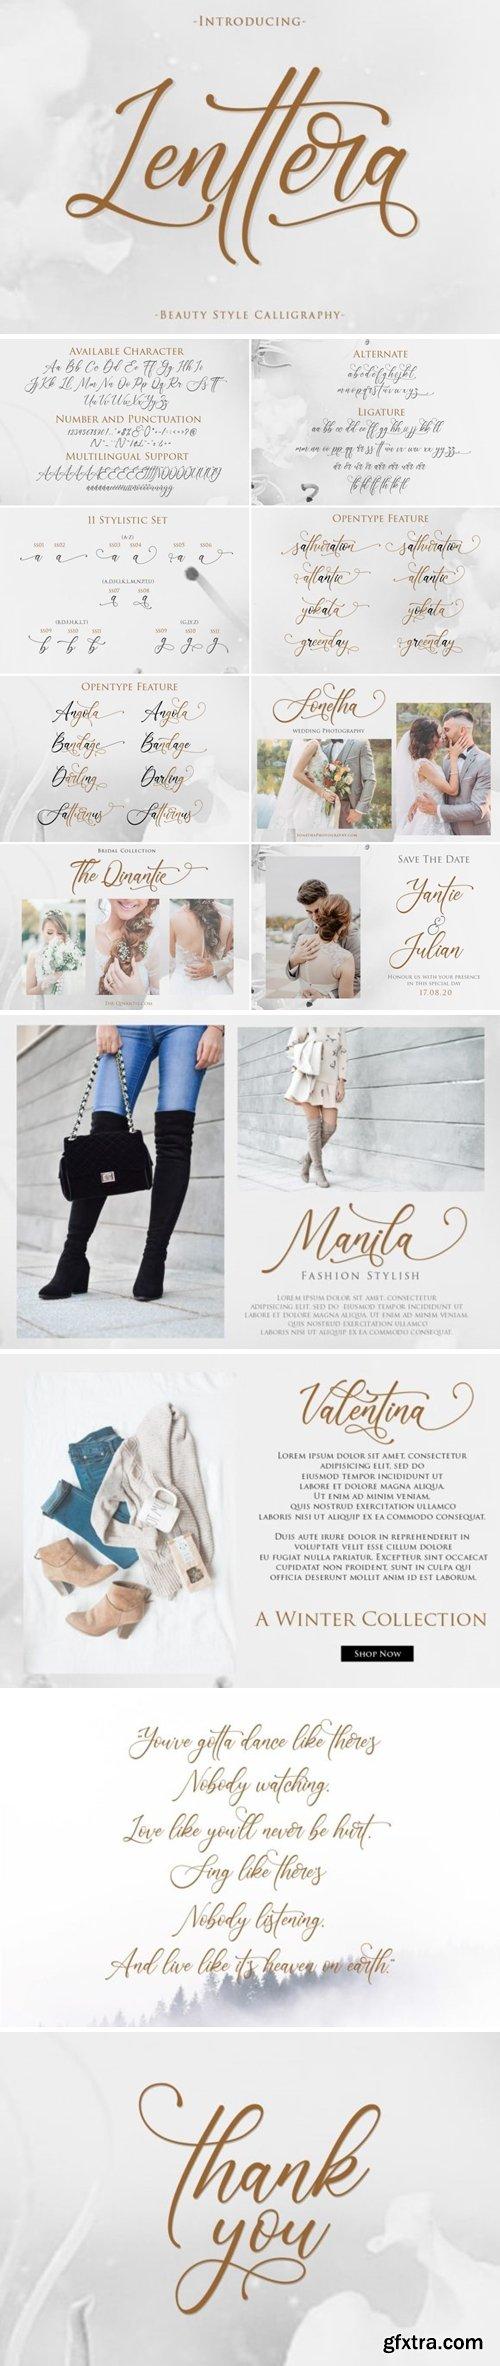 Fontbundles - Lenttera   Beauty Style Calligraphy 421704